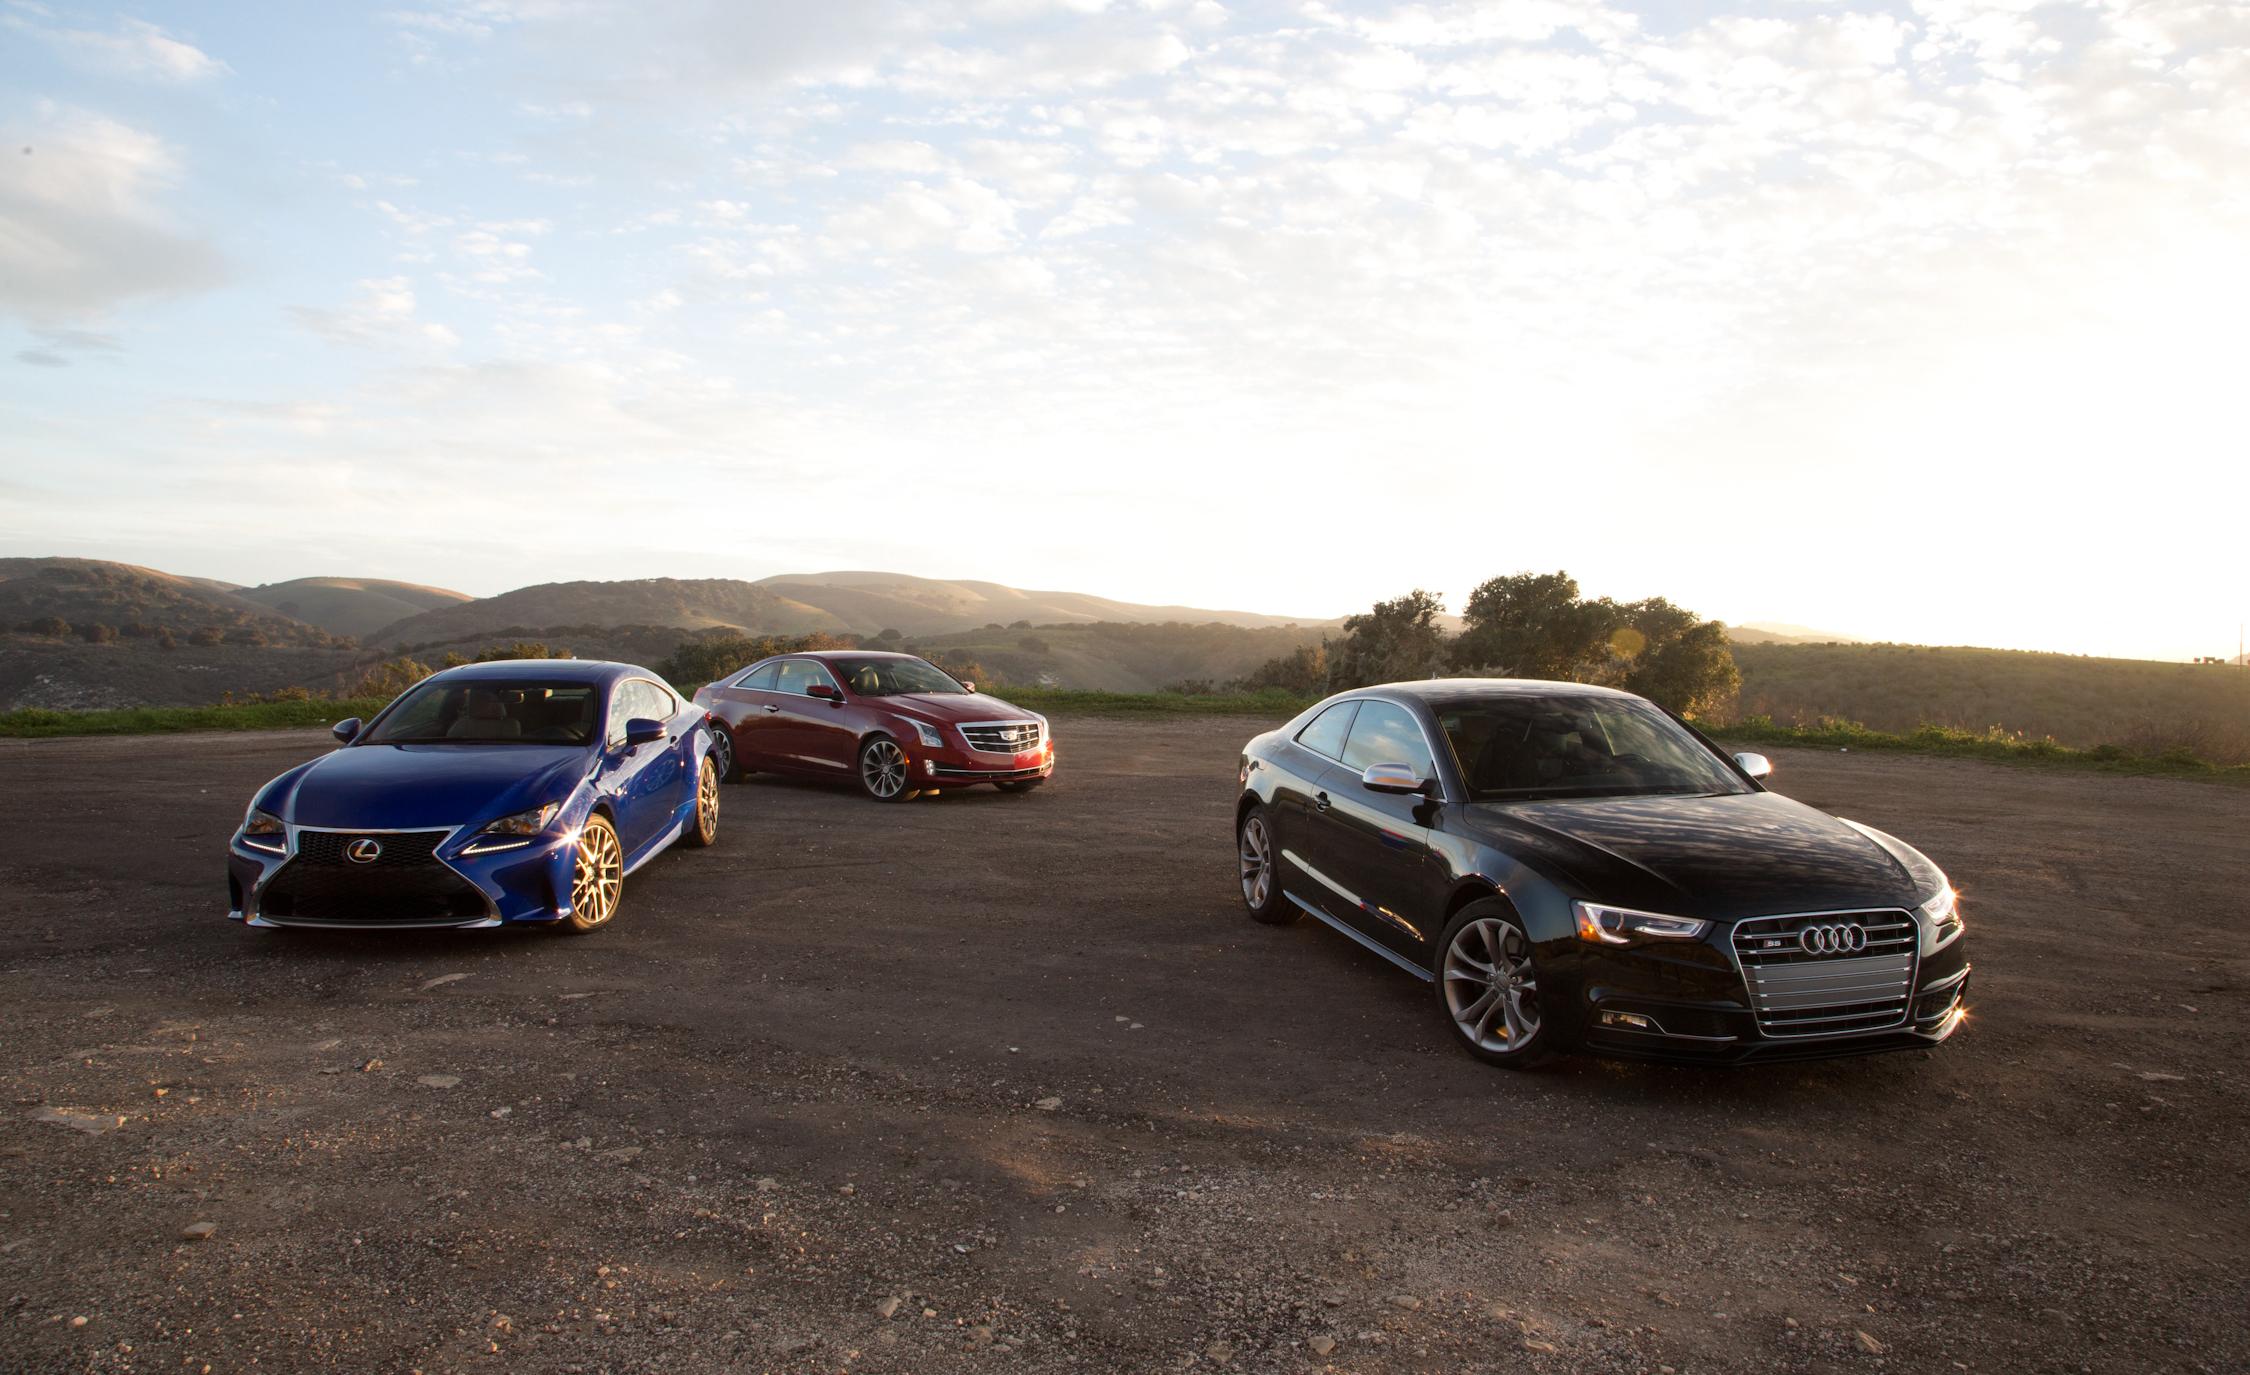 2015 Lexus RC350 F vs 2015 Audi S5 vs 2015 Cadillac ATS Coupe 3.6